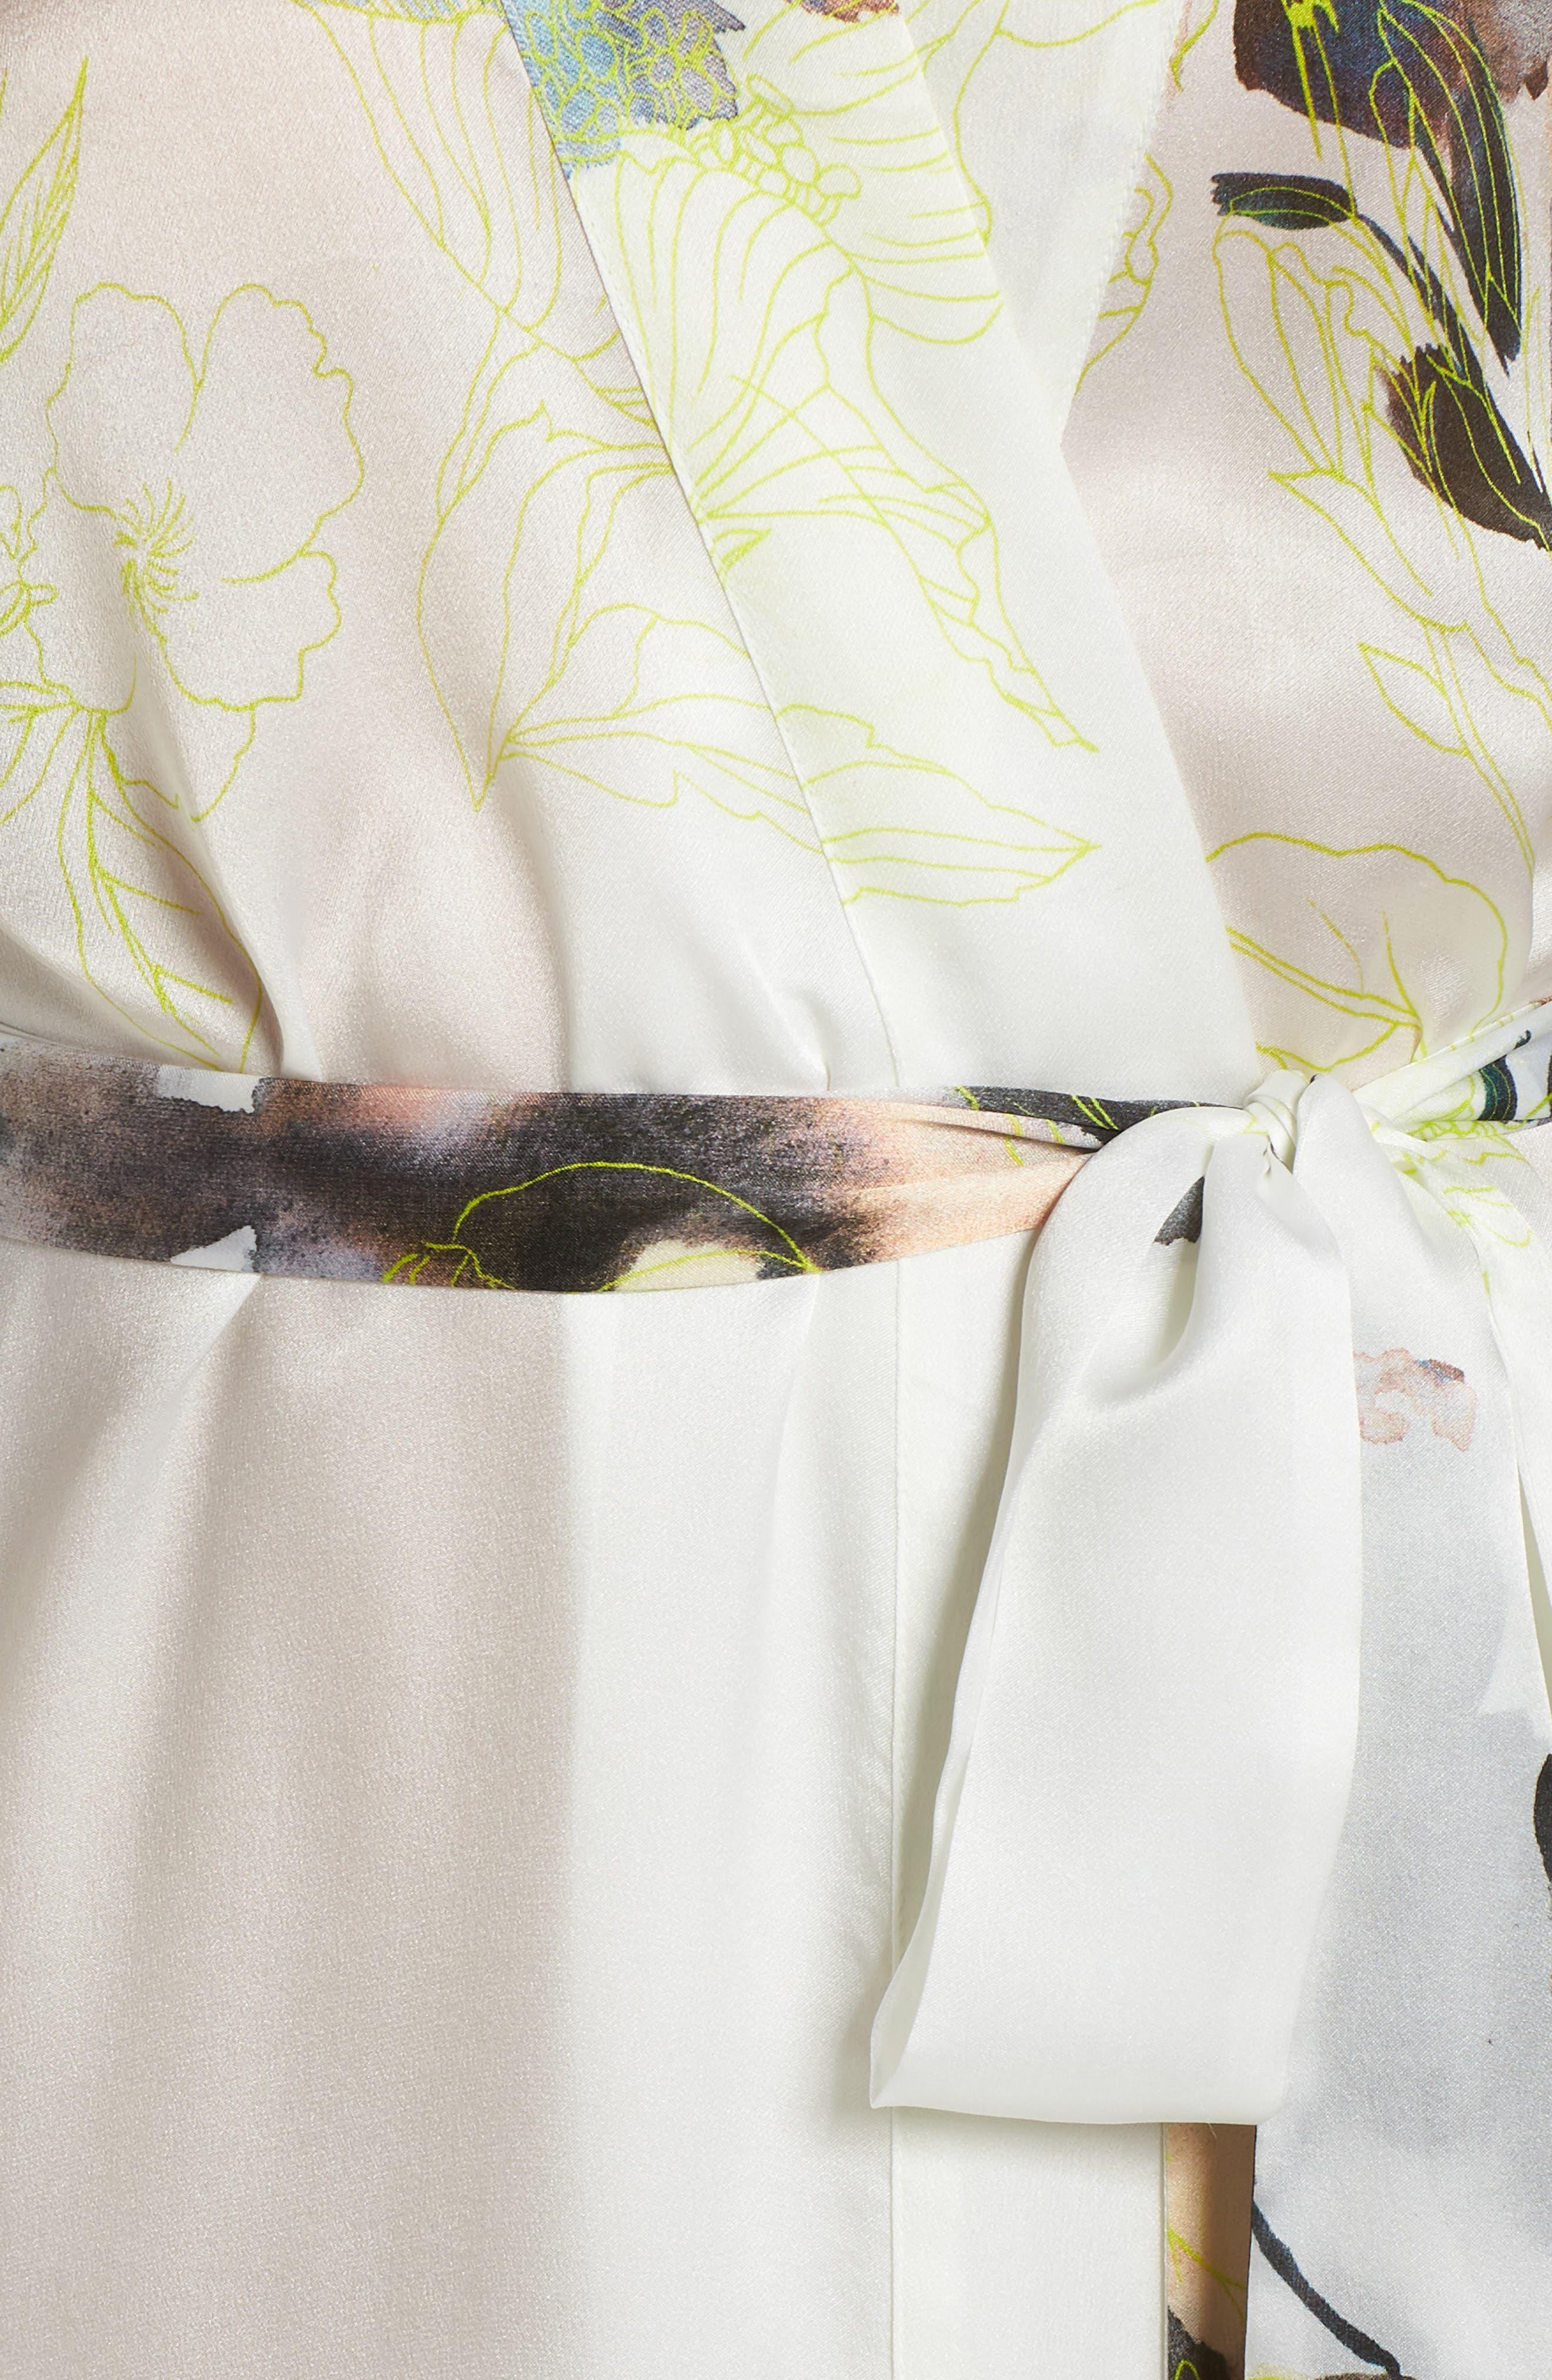 Floral Print Silk Robe,                             Alternate thumbnail 5, color,                             LIMELIGHT PRINT